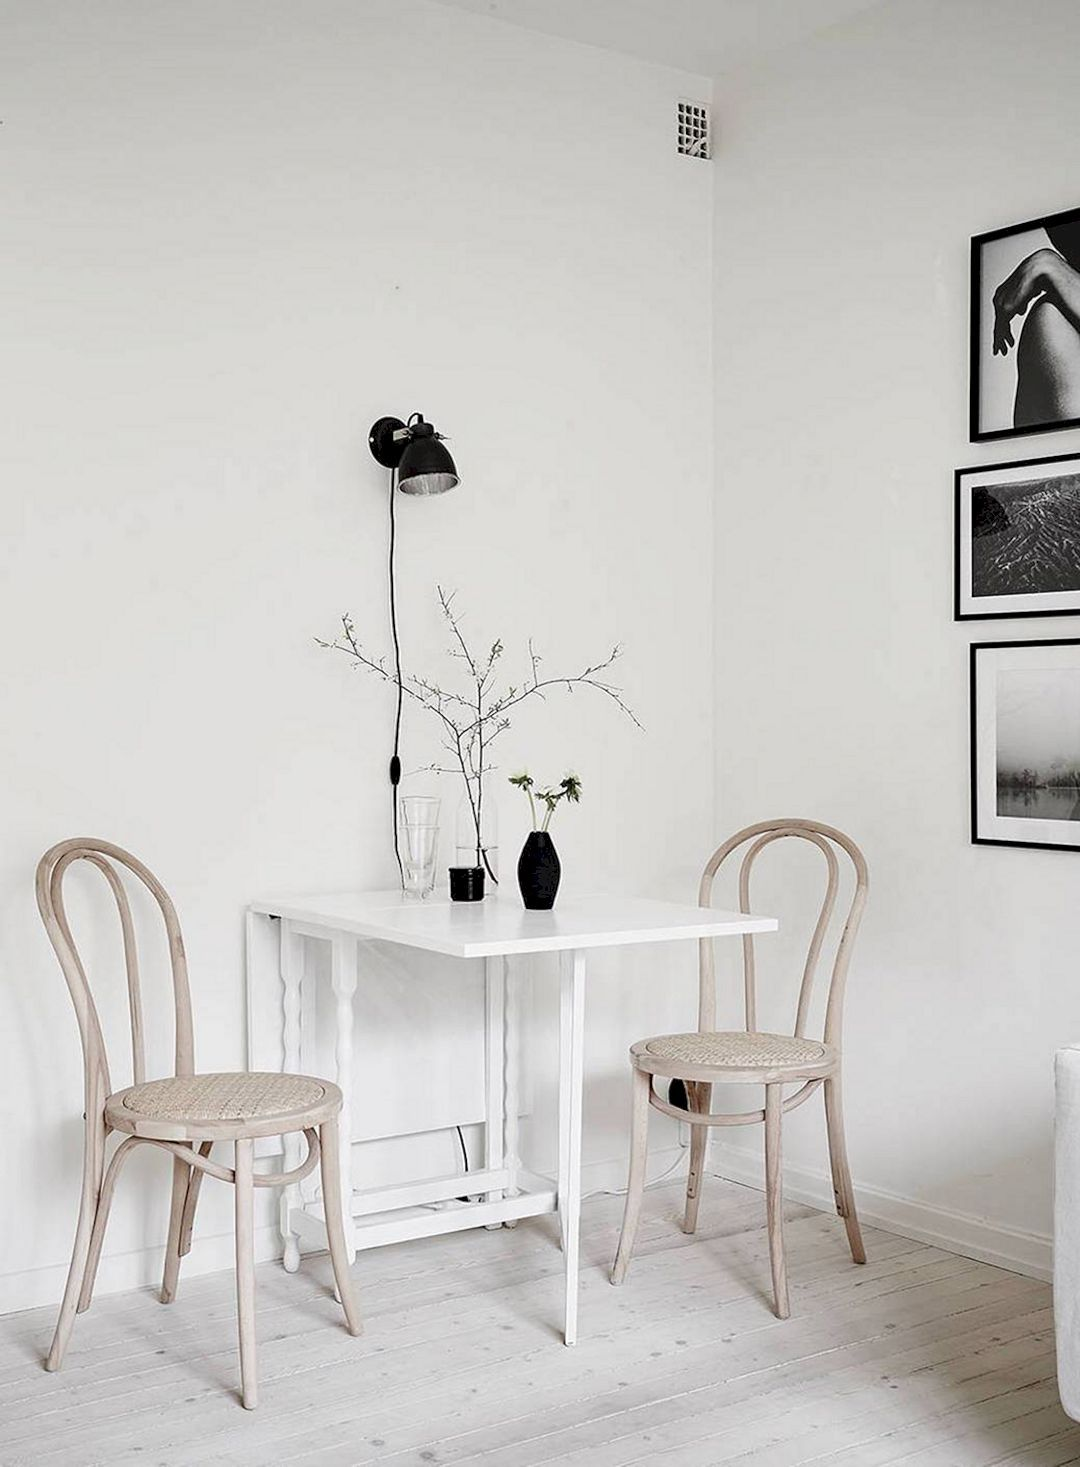 79 Astonishing Small Dining Room Designs  Https://www.futuristarchitecture.com/